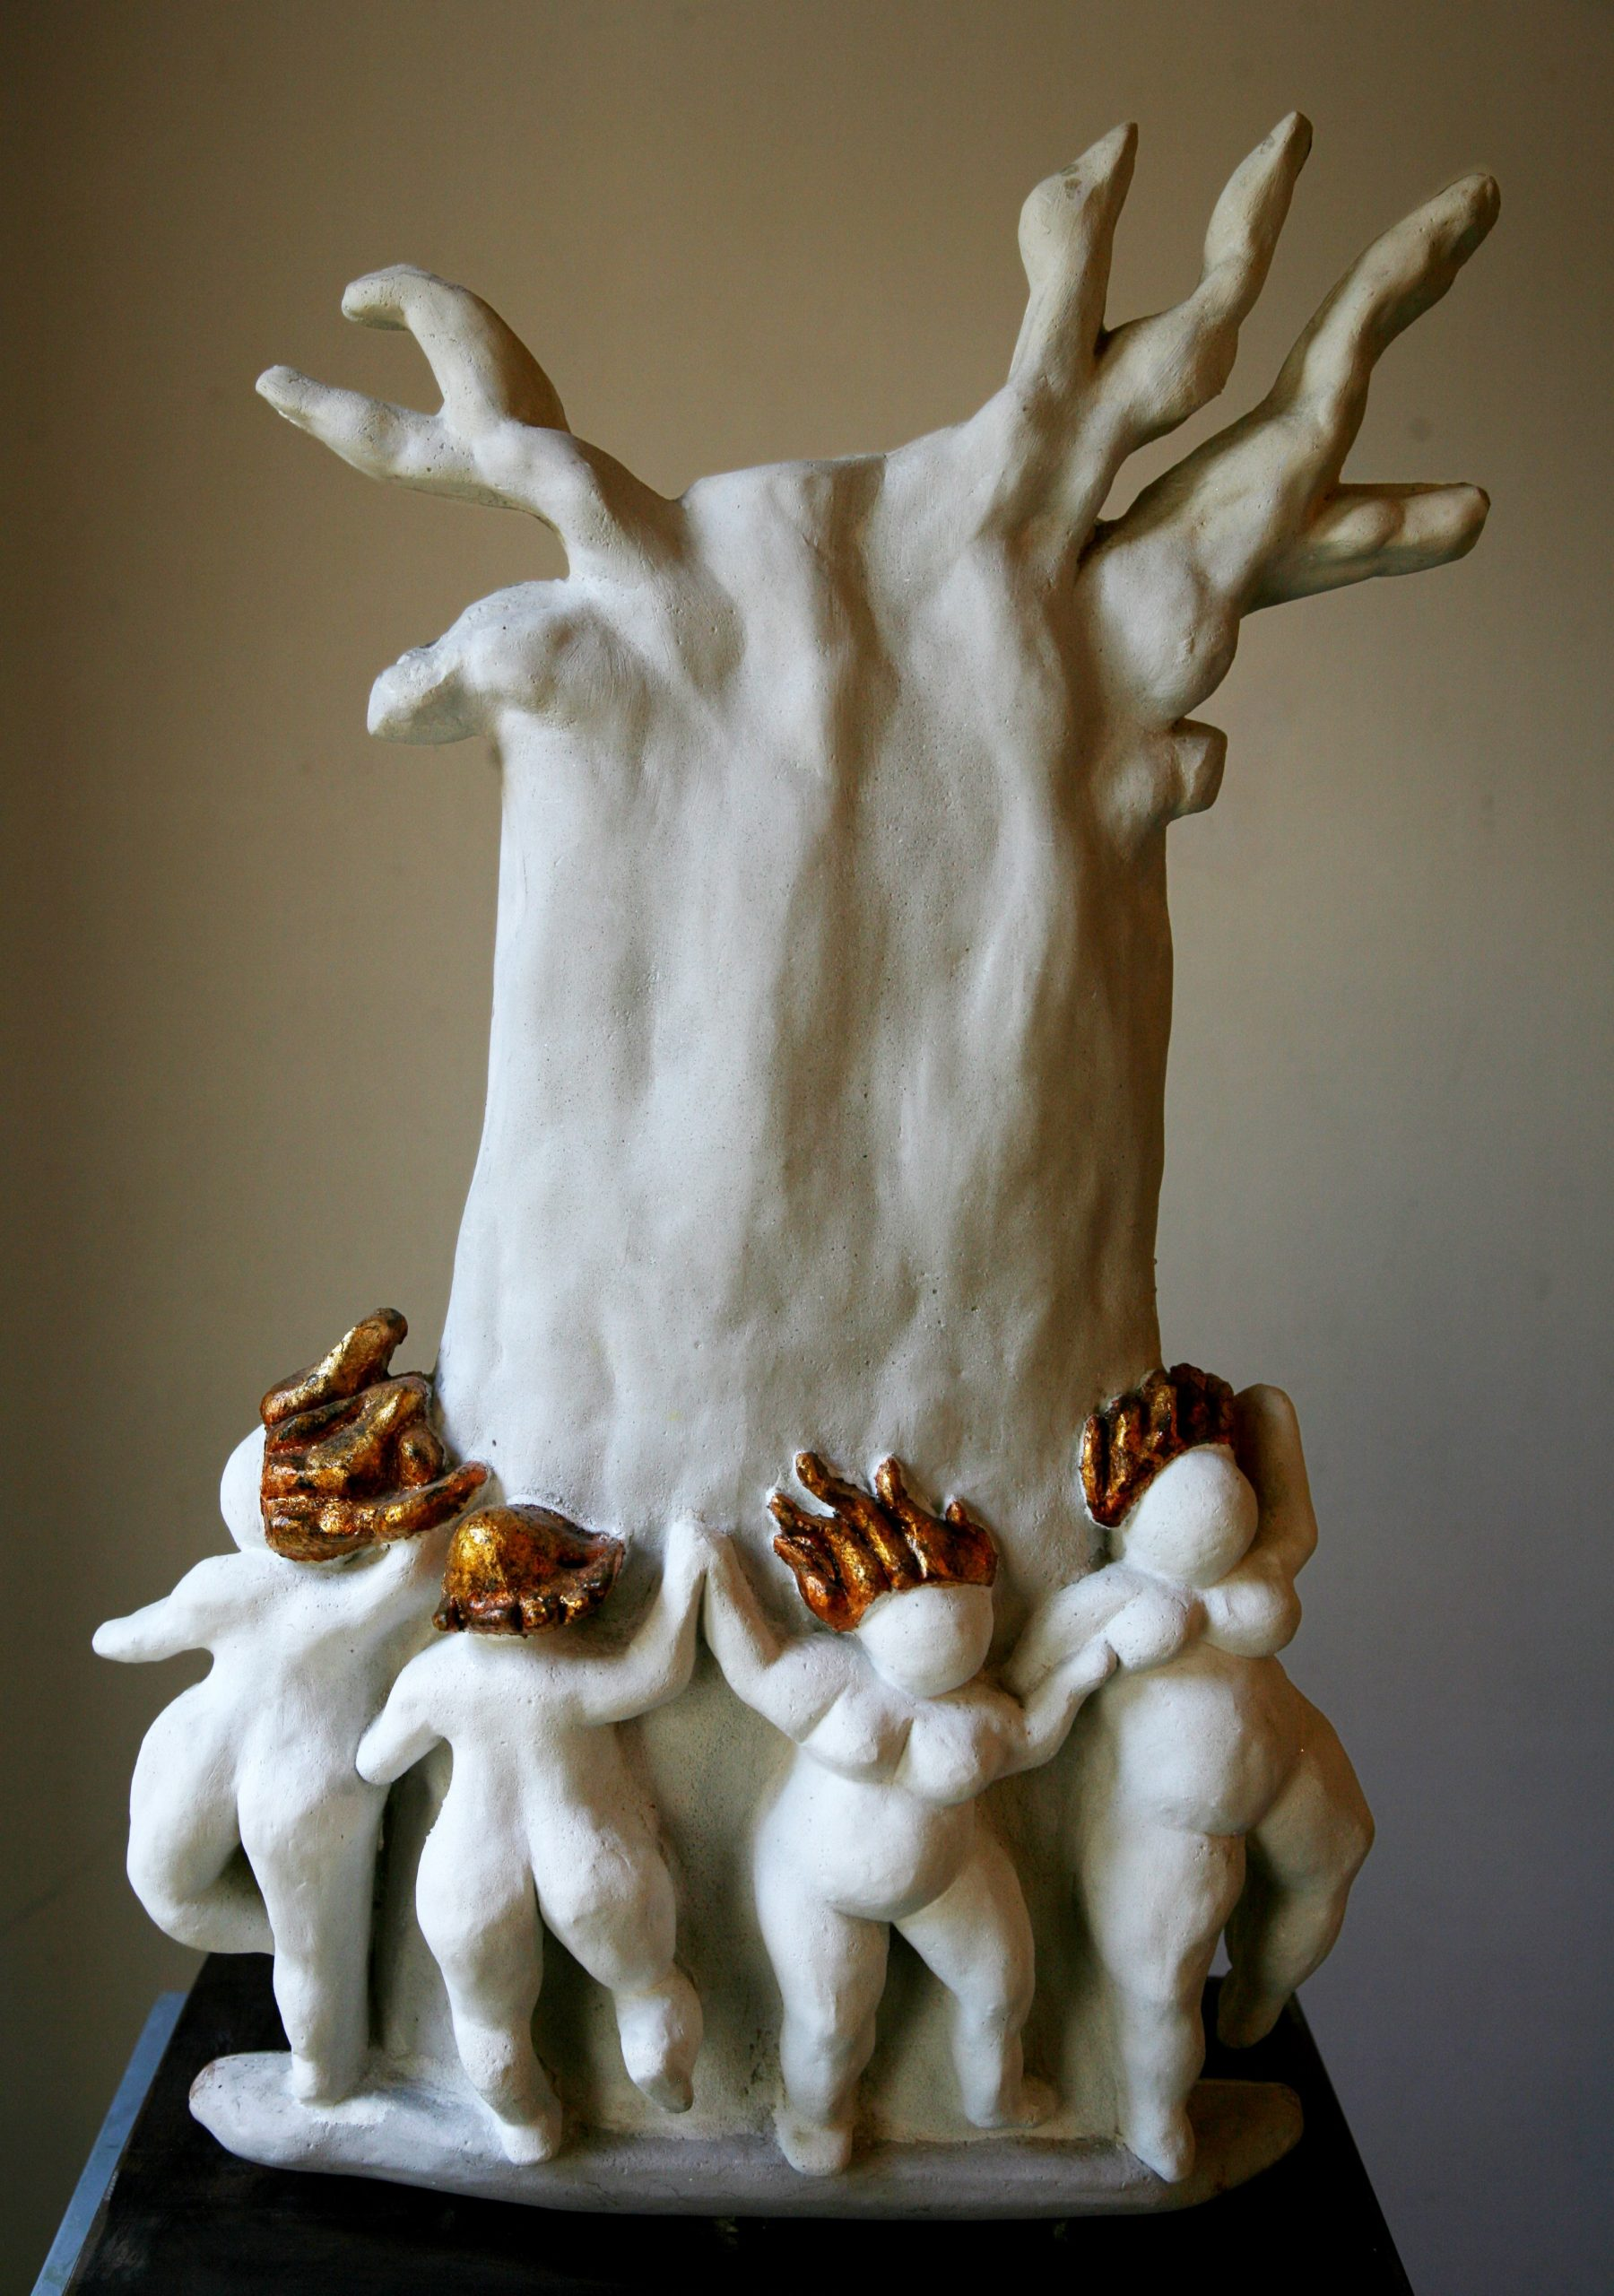 Nude women dancing around baobab tree